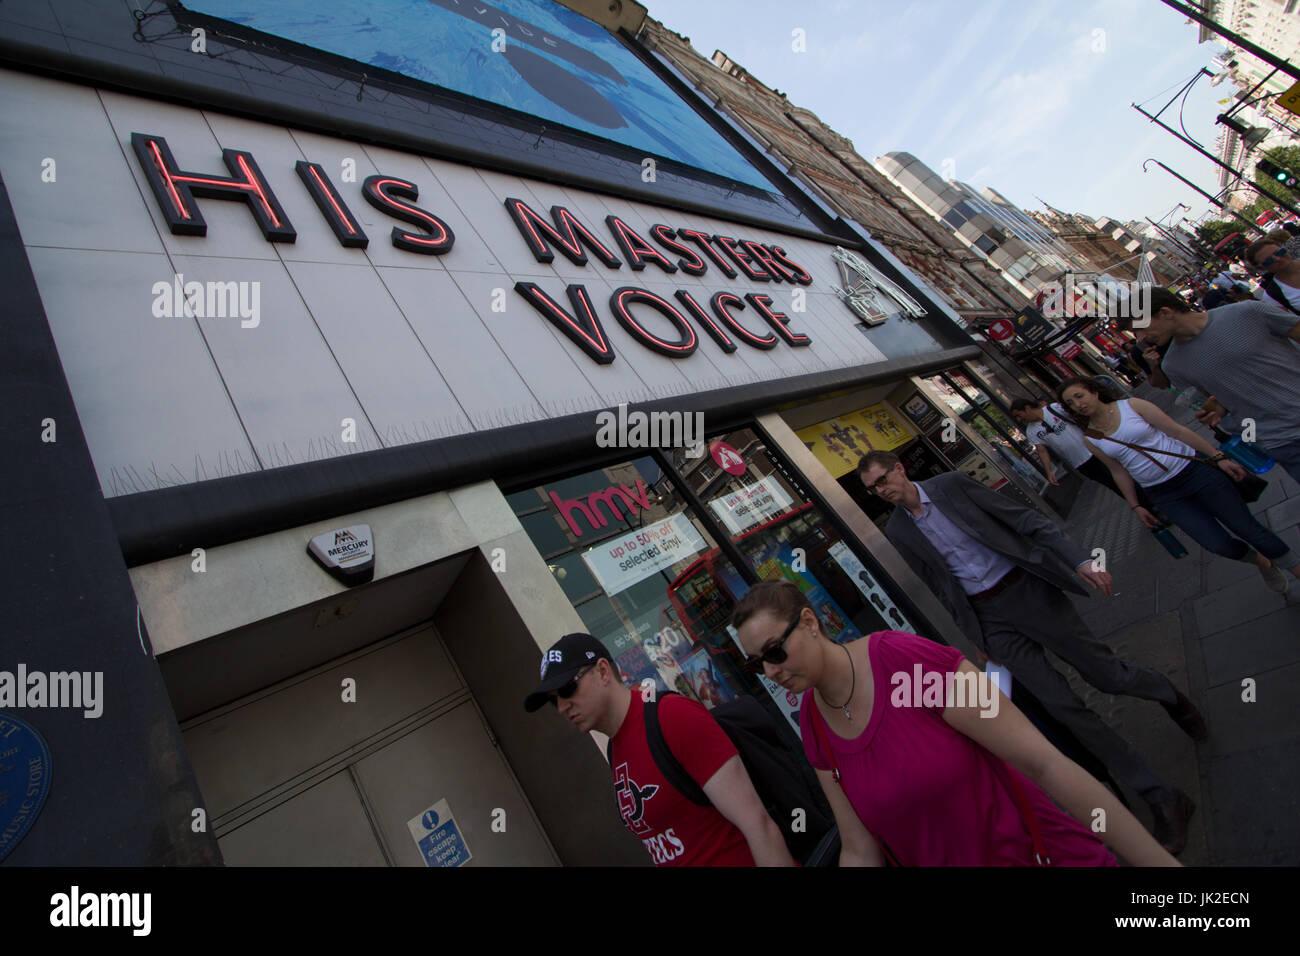 HMV His masters voice, Oxford Street - Stock Image